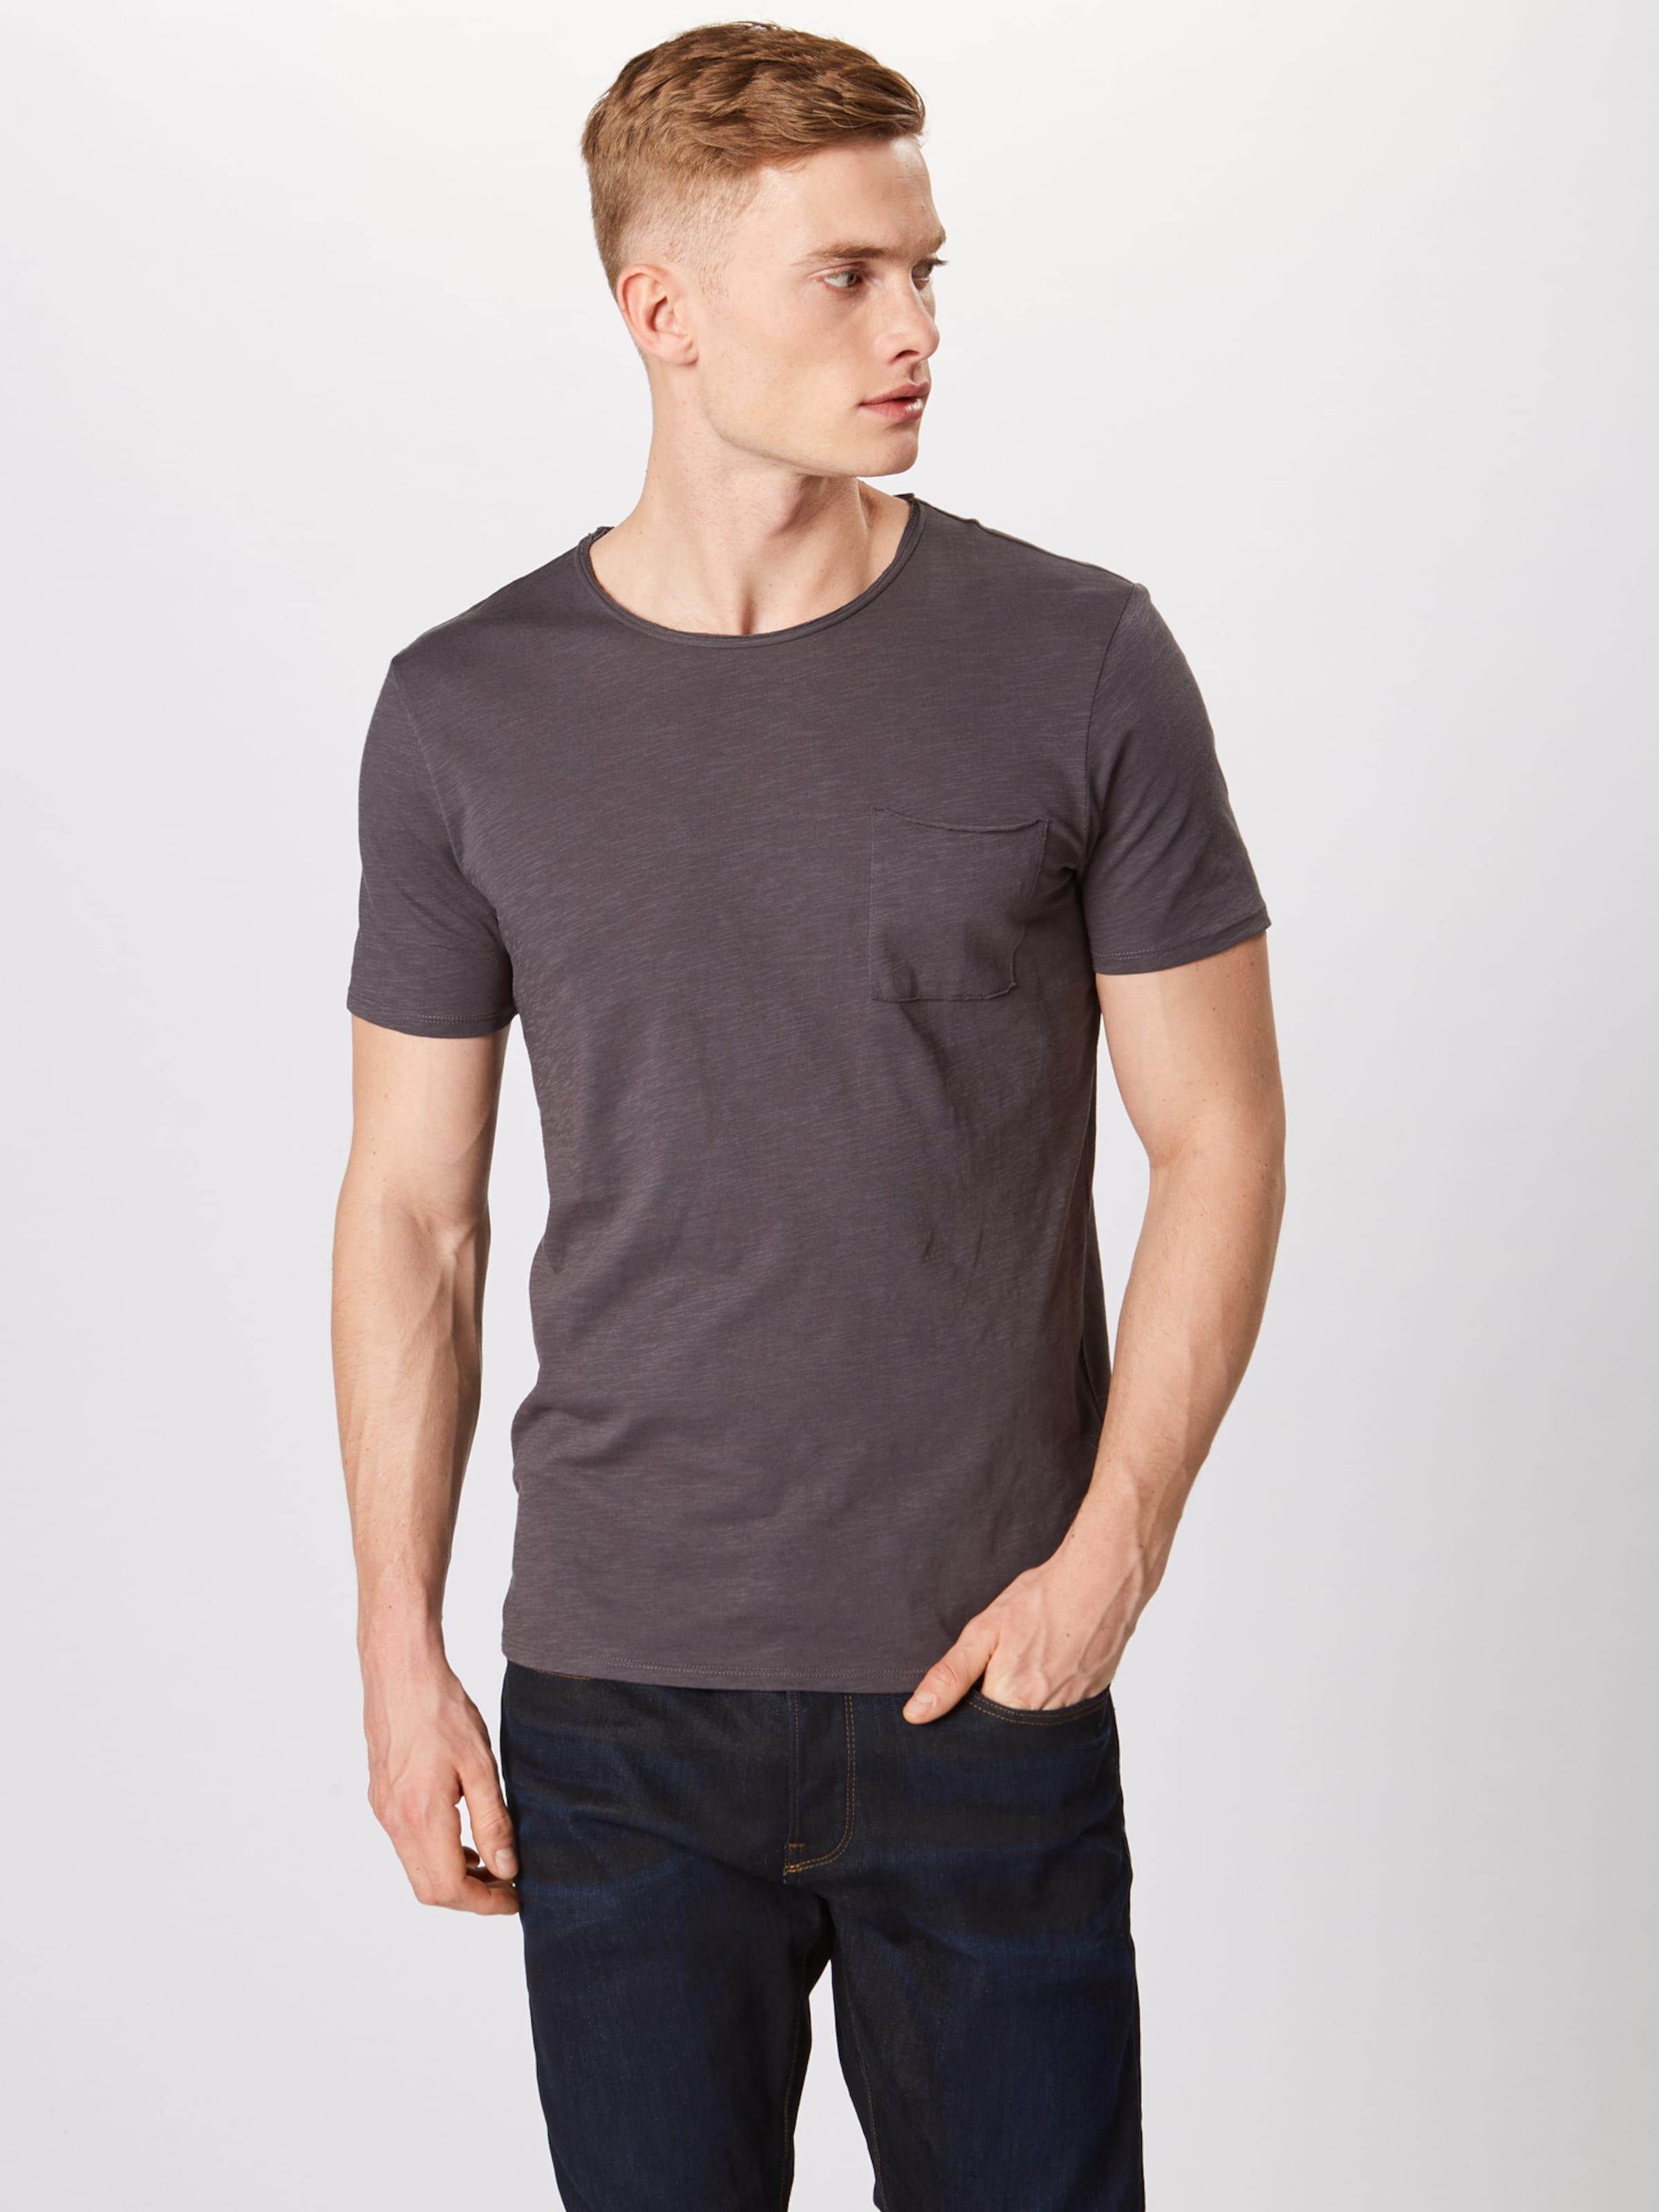 Marc 't O'polo Blanc T En shirt shirts Short Sleeve' 5SRjLc3q4A